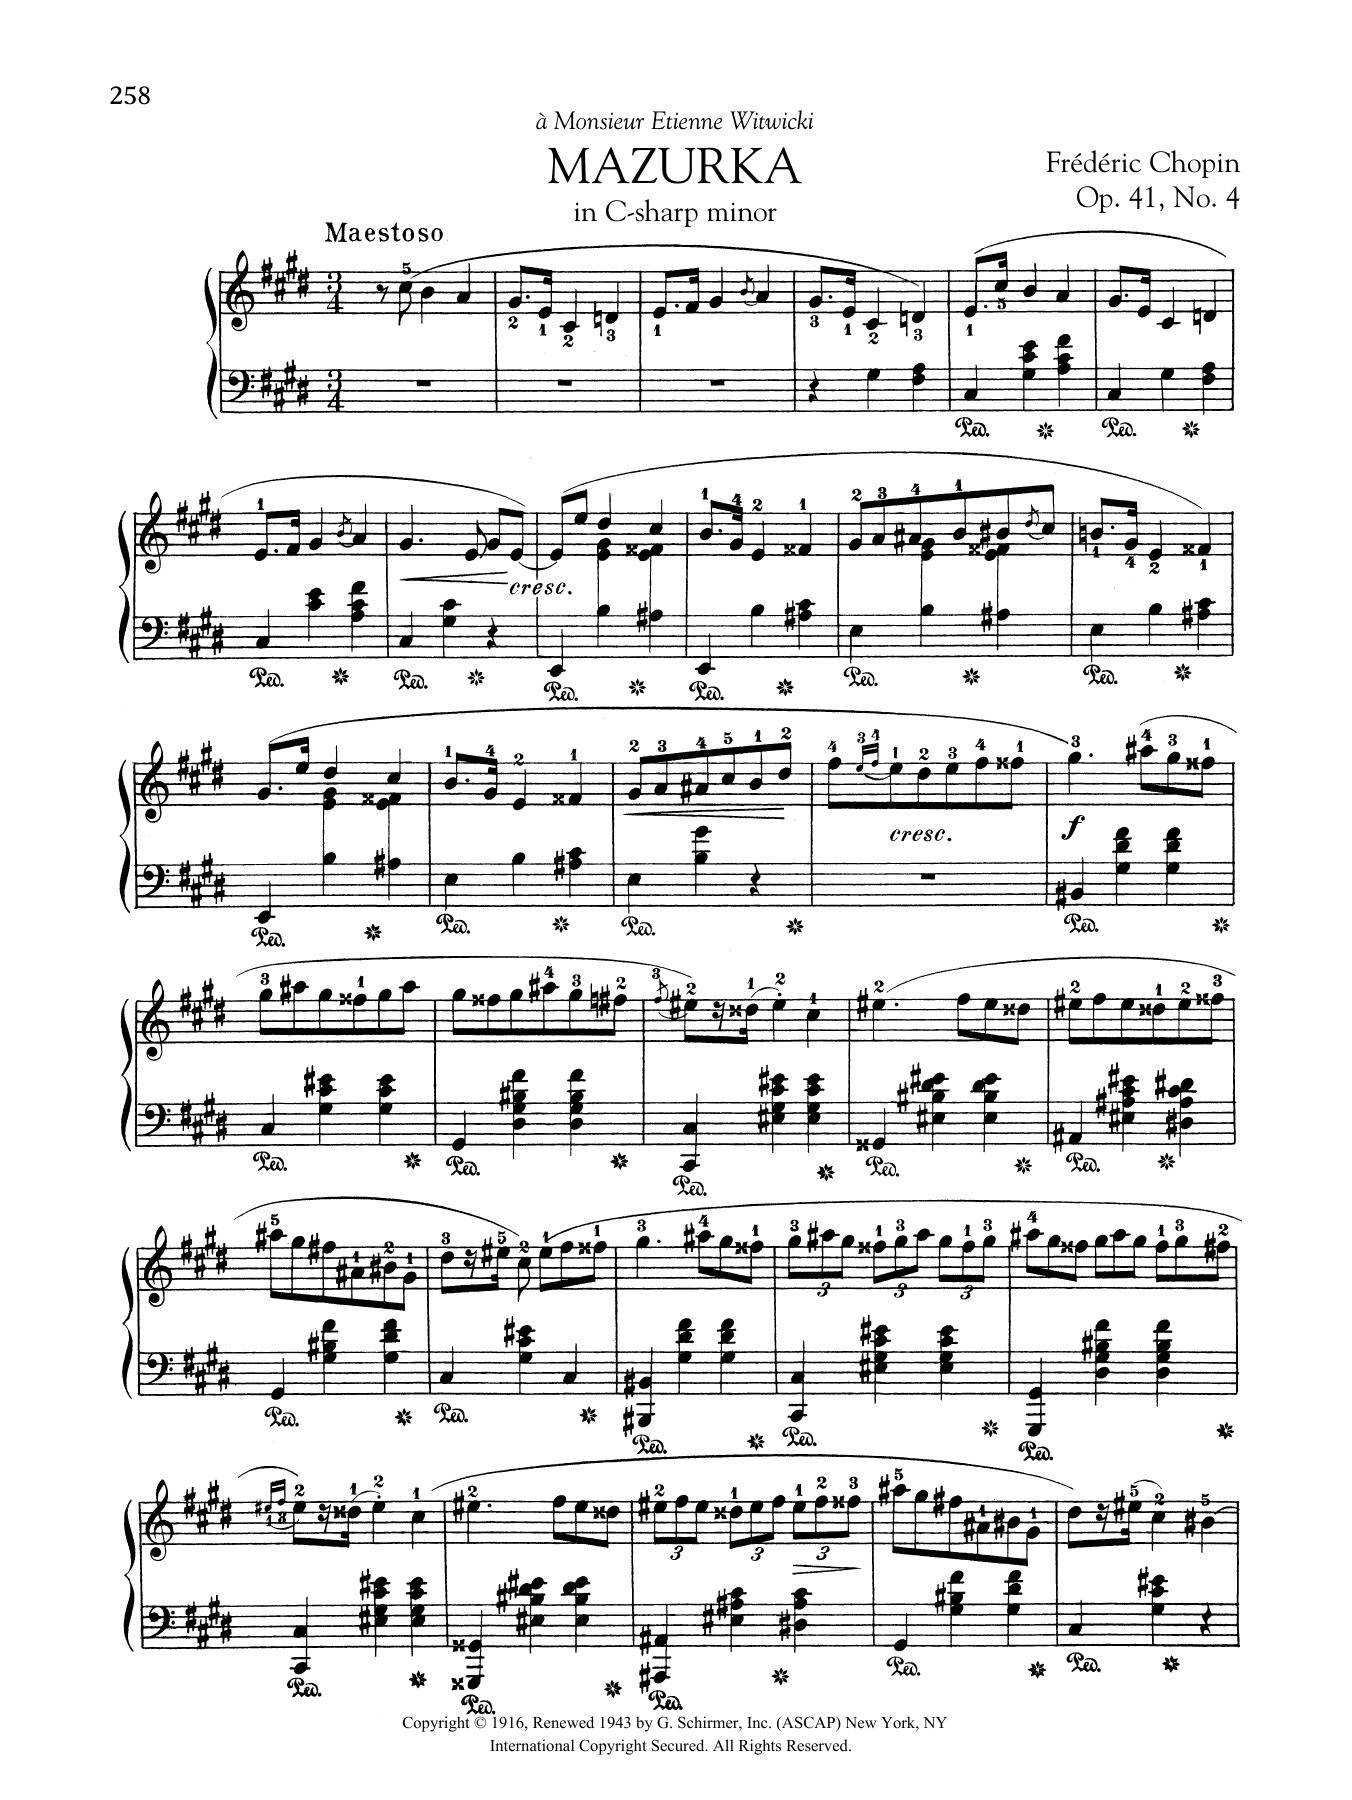 Mazurka in C-sharp minor, Op. 41, No. 4 Sheet Music